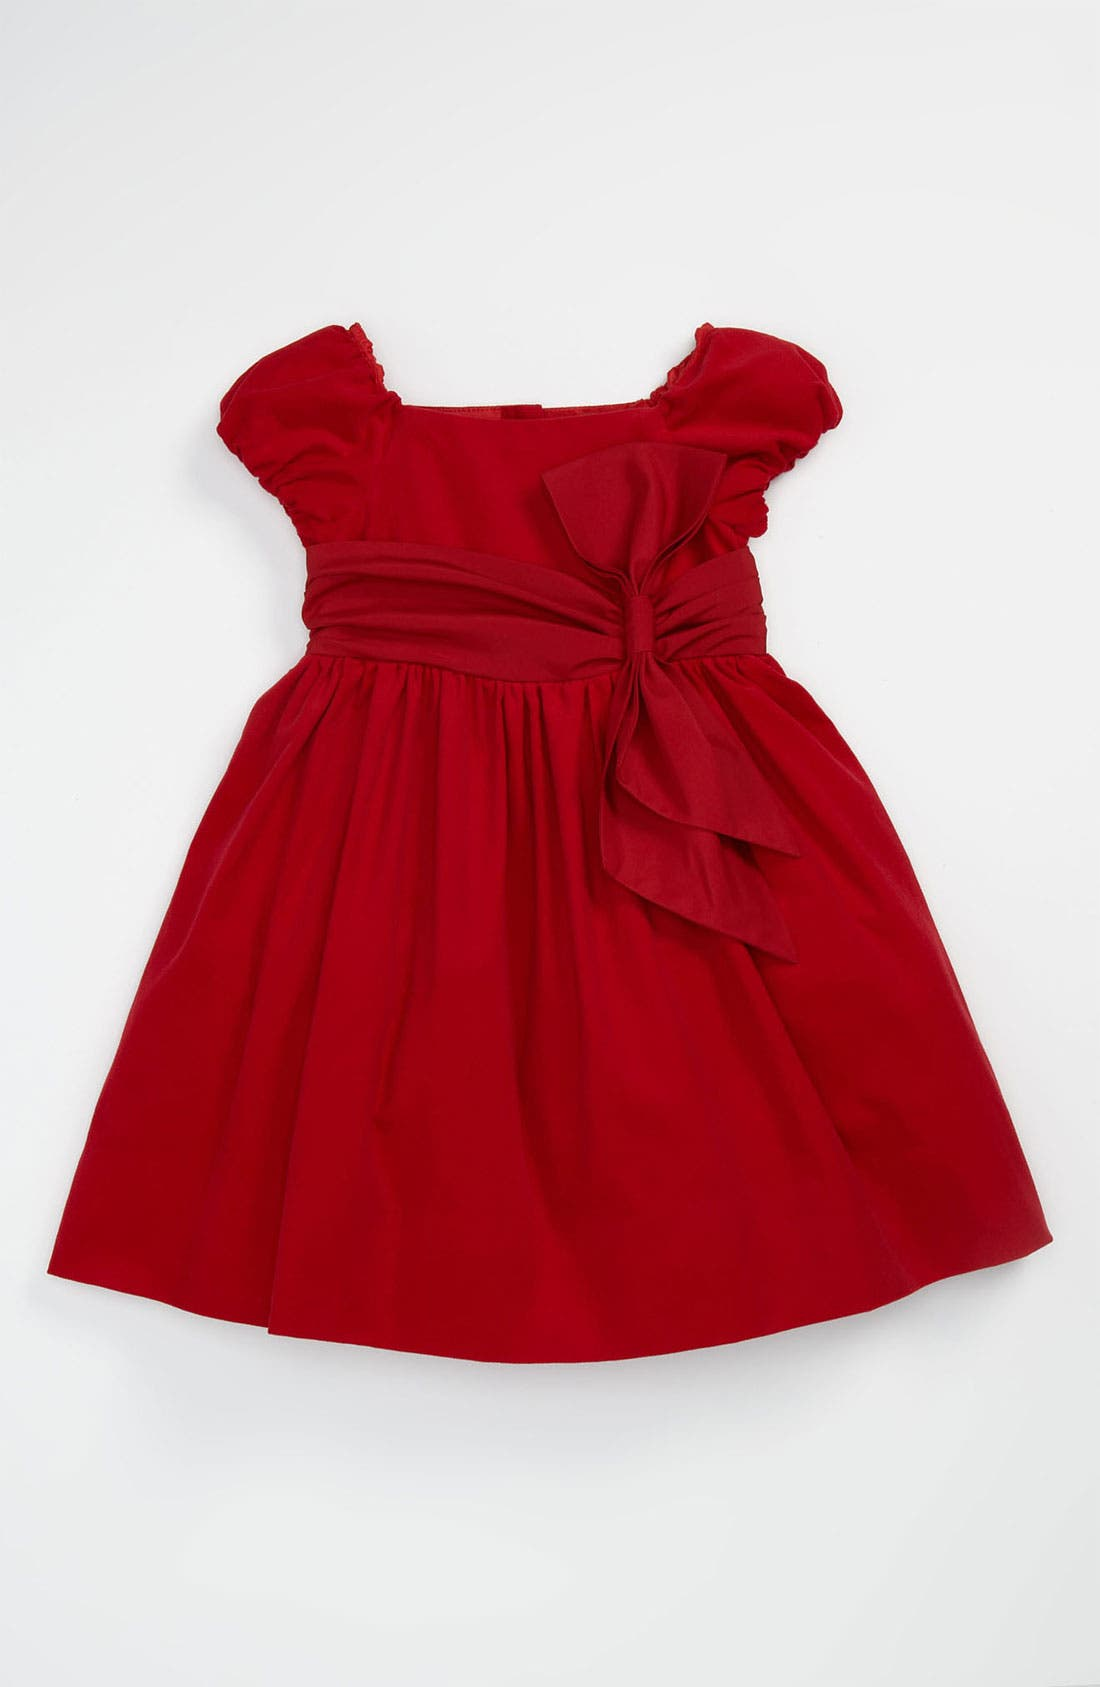 Main Image - Ralph Lauren Corduroy Party Dress (Toddler)